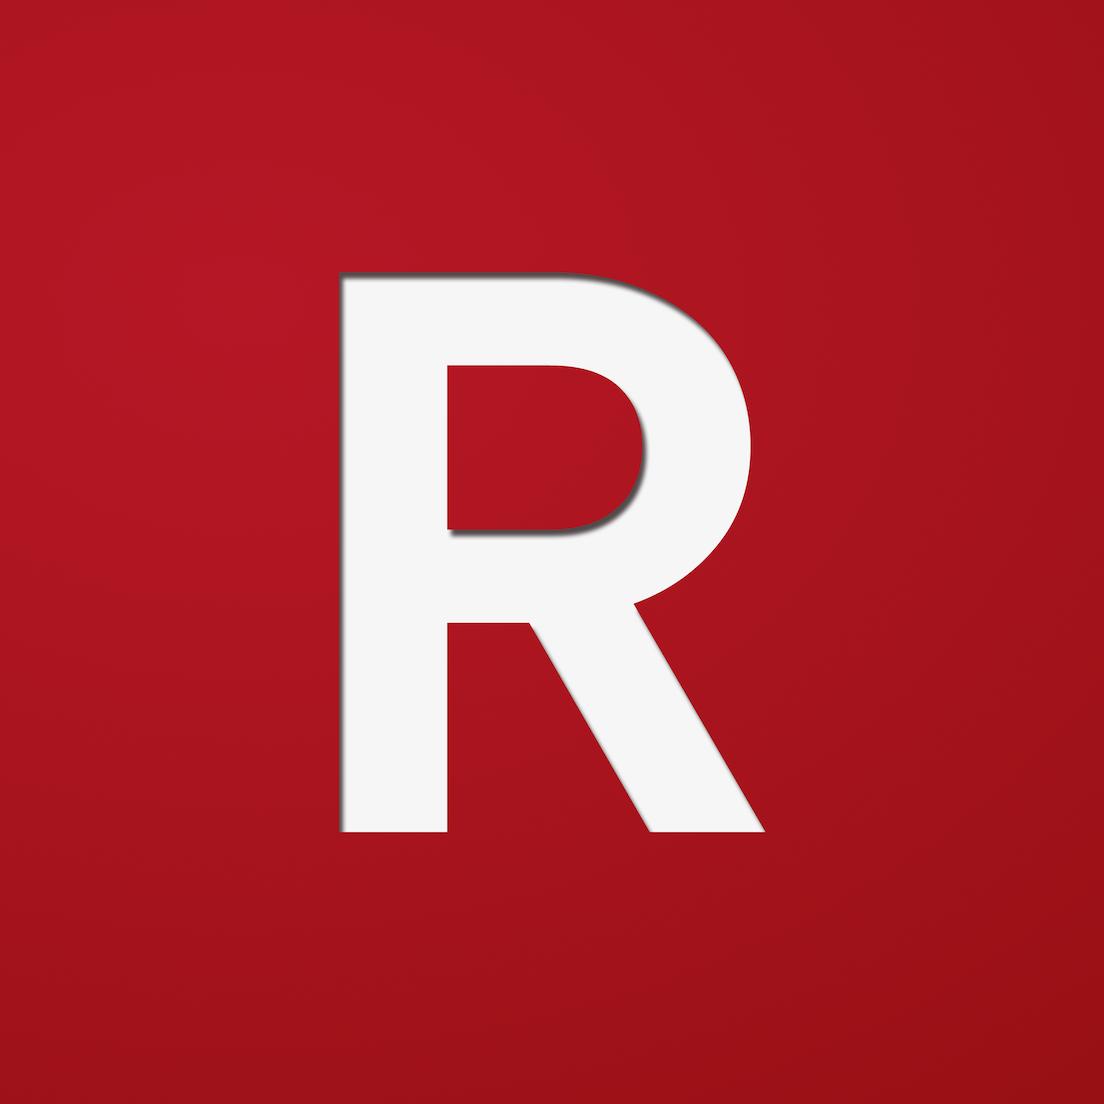 RedPrice